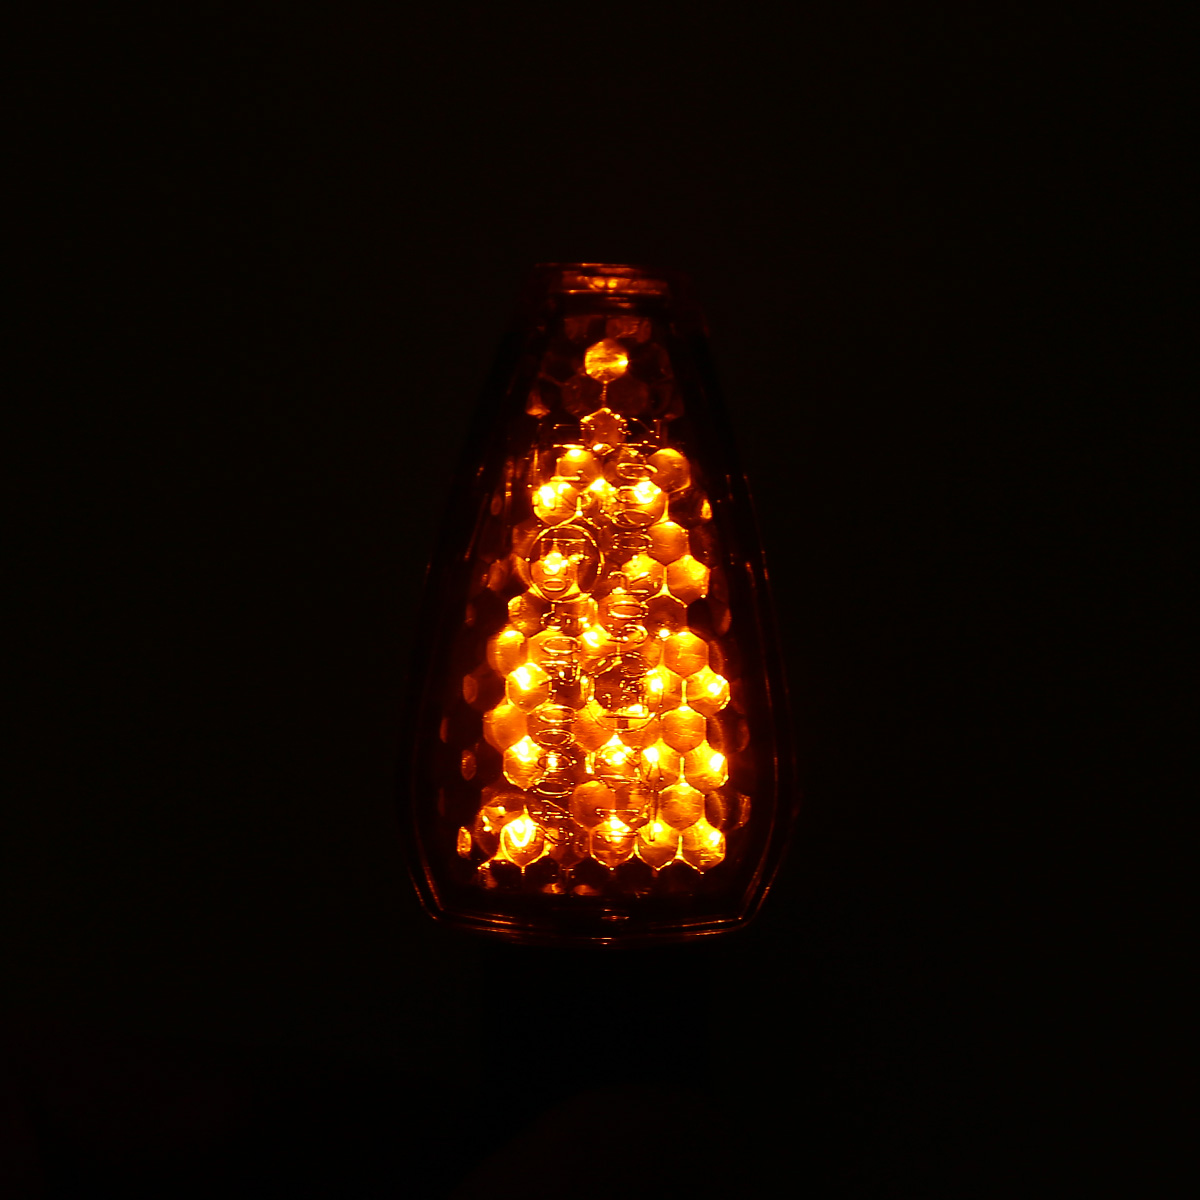 4pcs Super Bright Indicator Blinker 12V 15 LED Amber Motorcycle Turn Signal Light For Honda For Yamaha